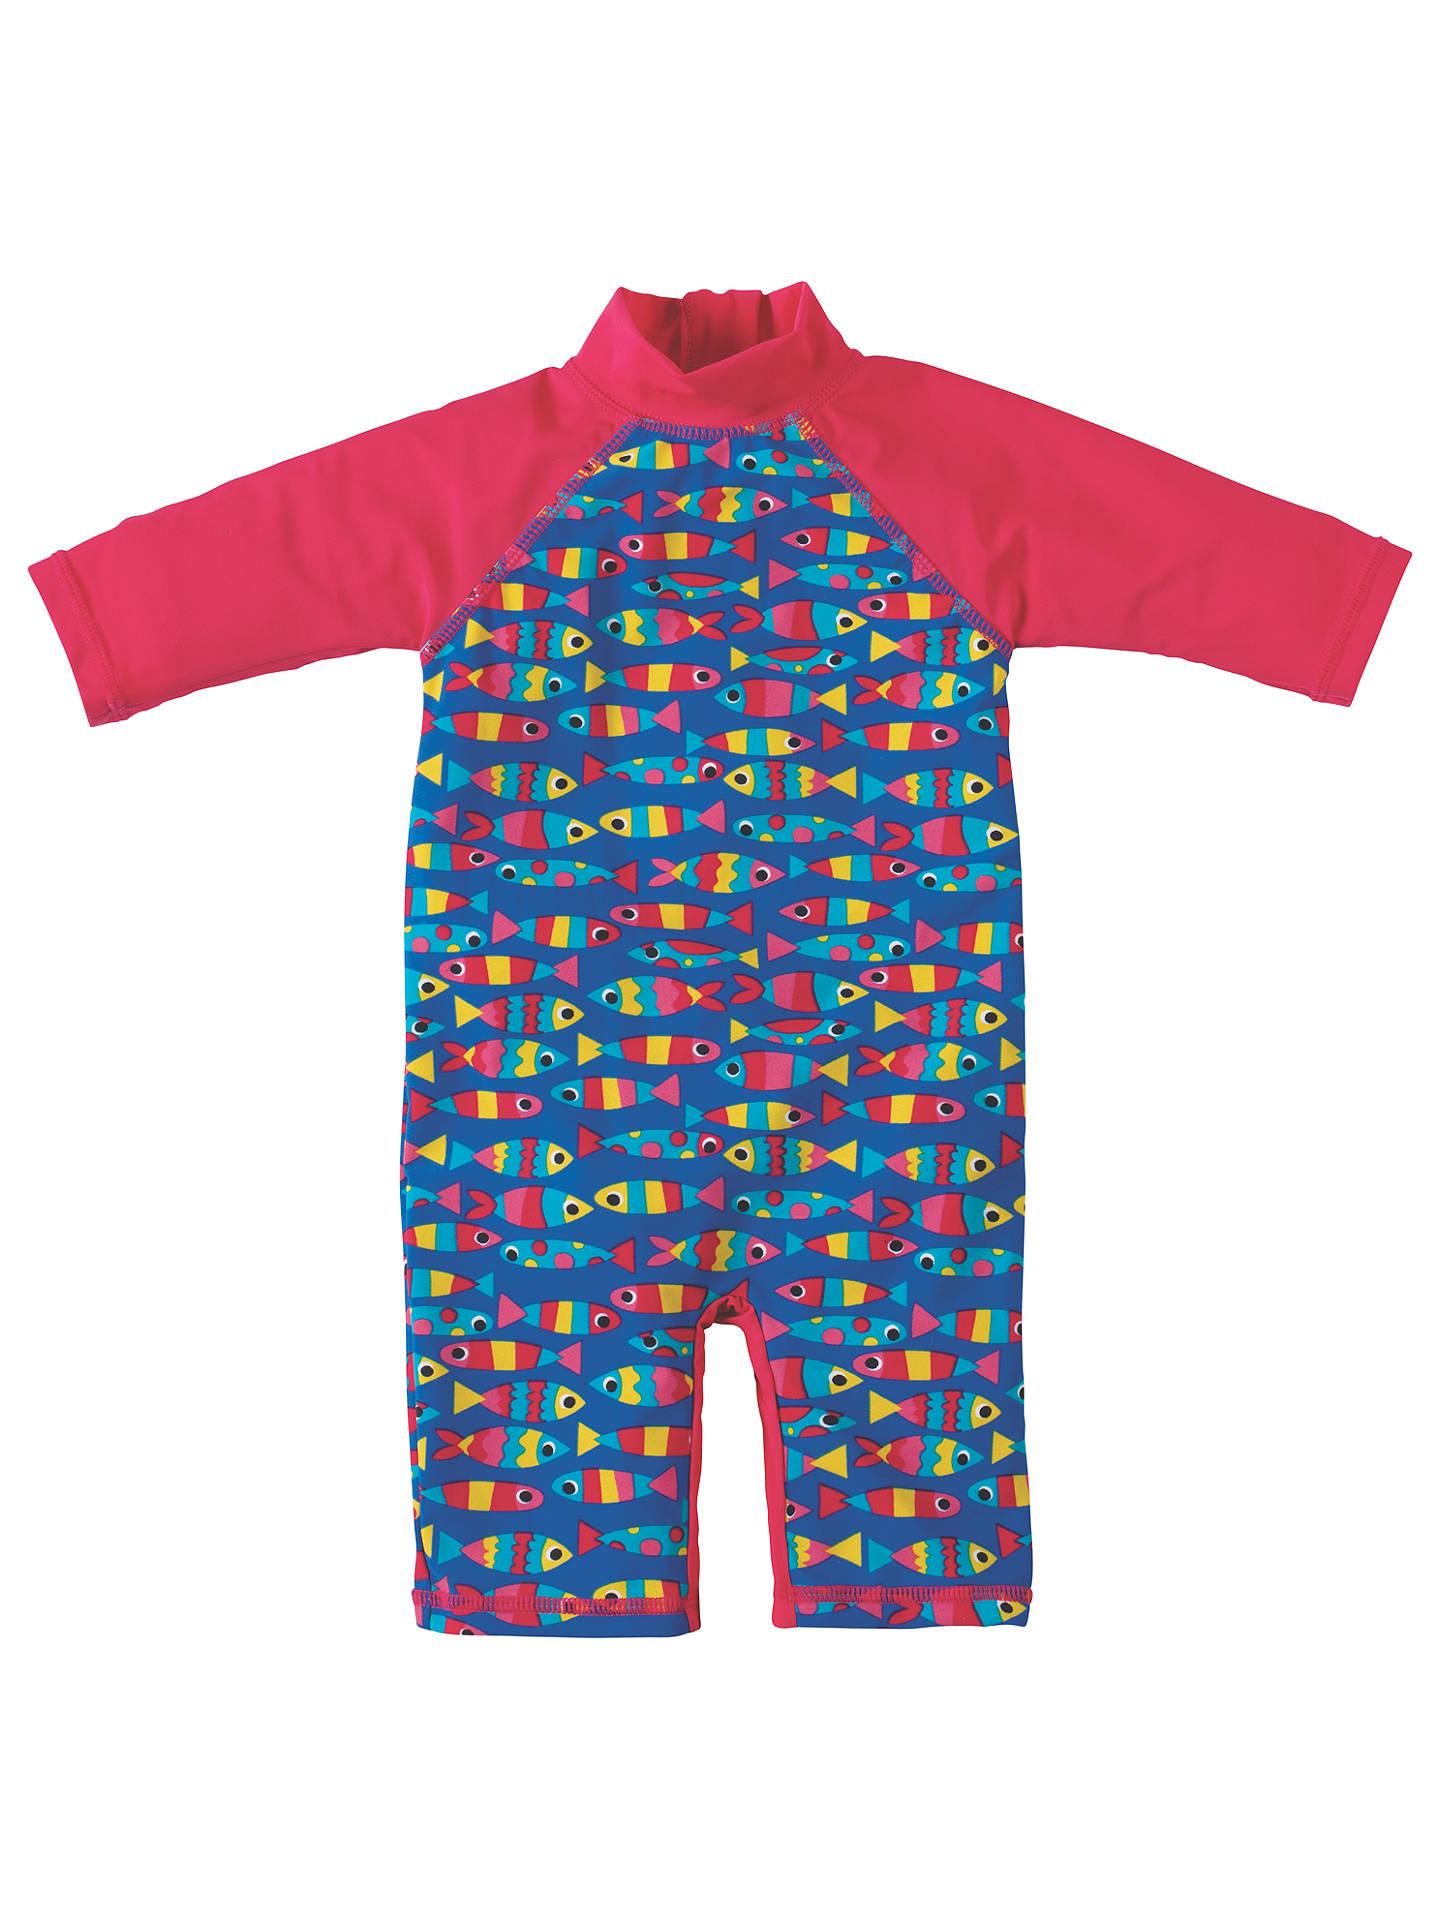 ddf87902a4be9 Buy Frugi Organic Baby Little Sun Safe Fish Sunpro Suit, Blue, 0-3 ...